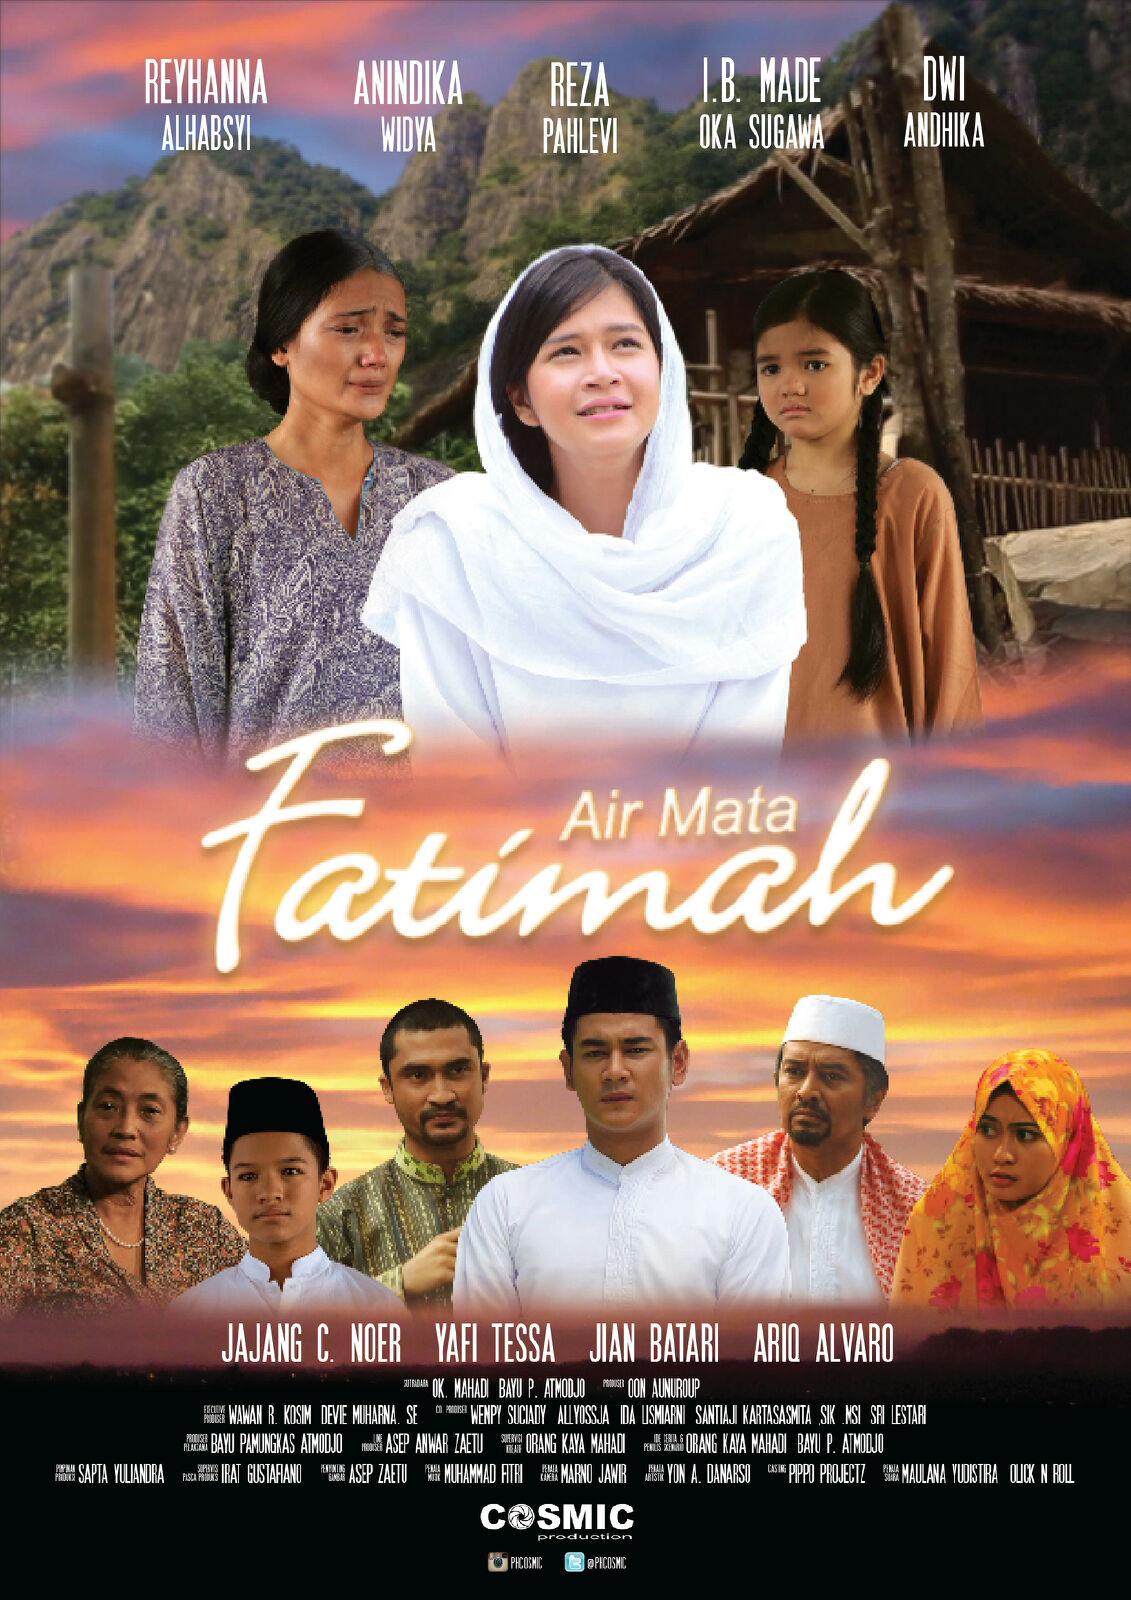 Nonton Air mata fatimah (2015) Full Movie